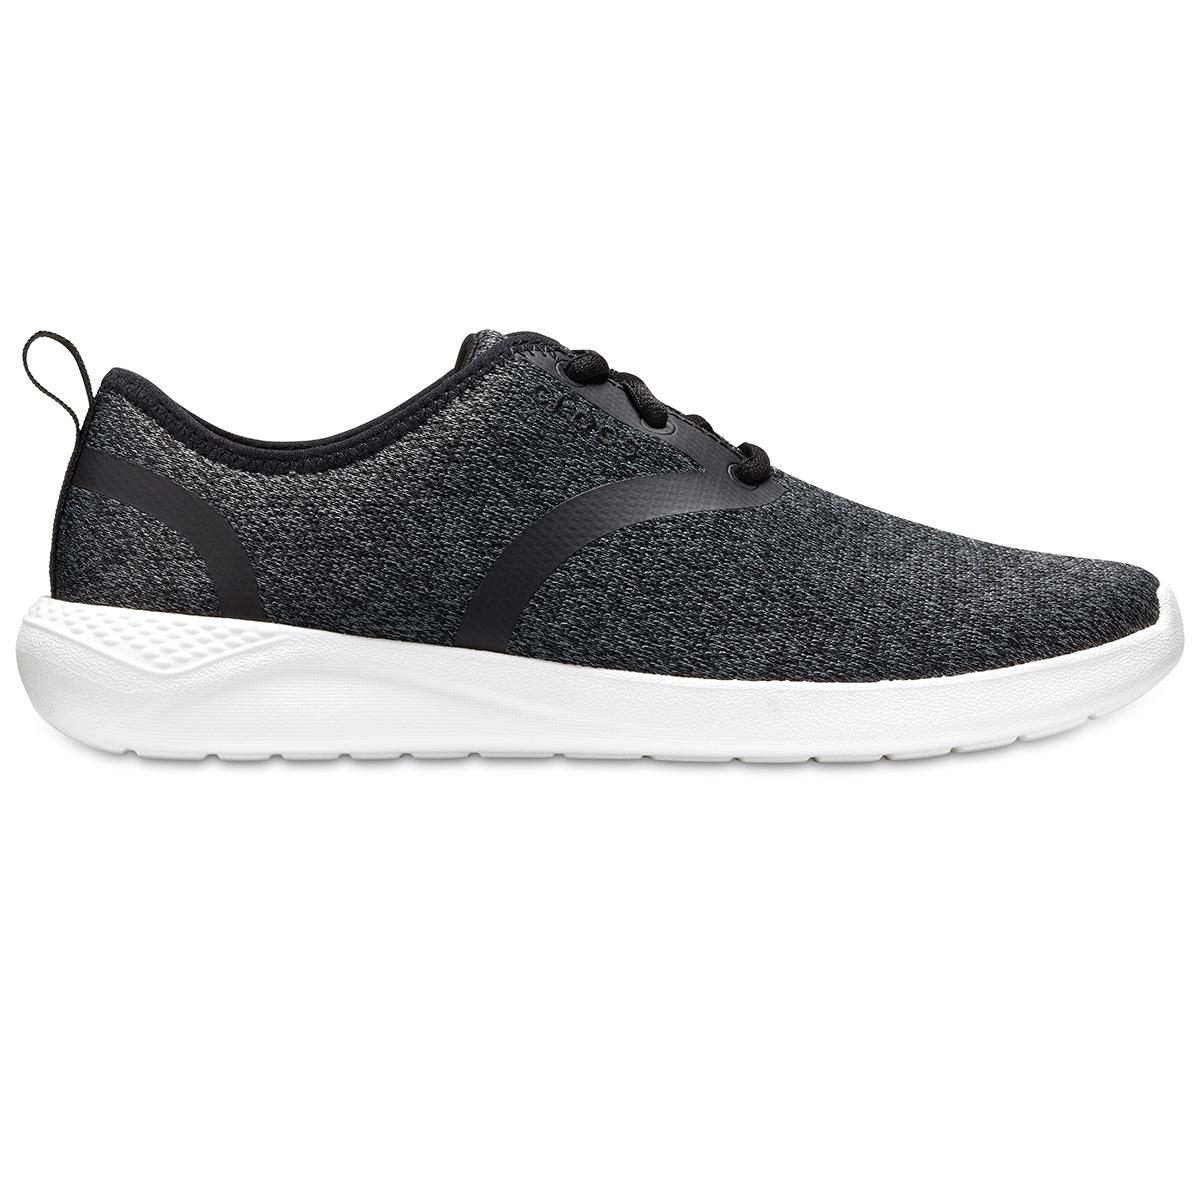 Crocs LiteRide Lace M - Siyah/Beyaz